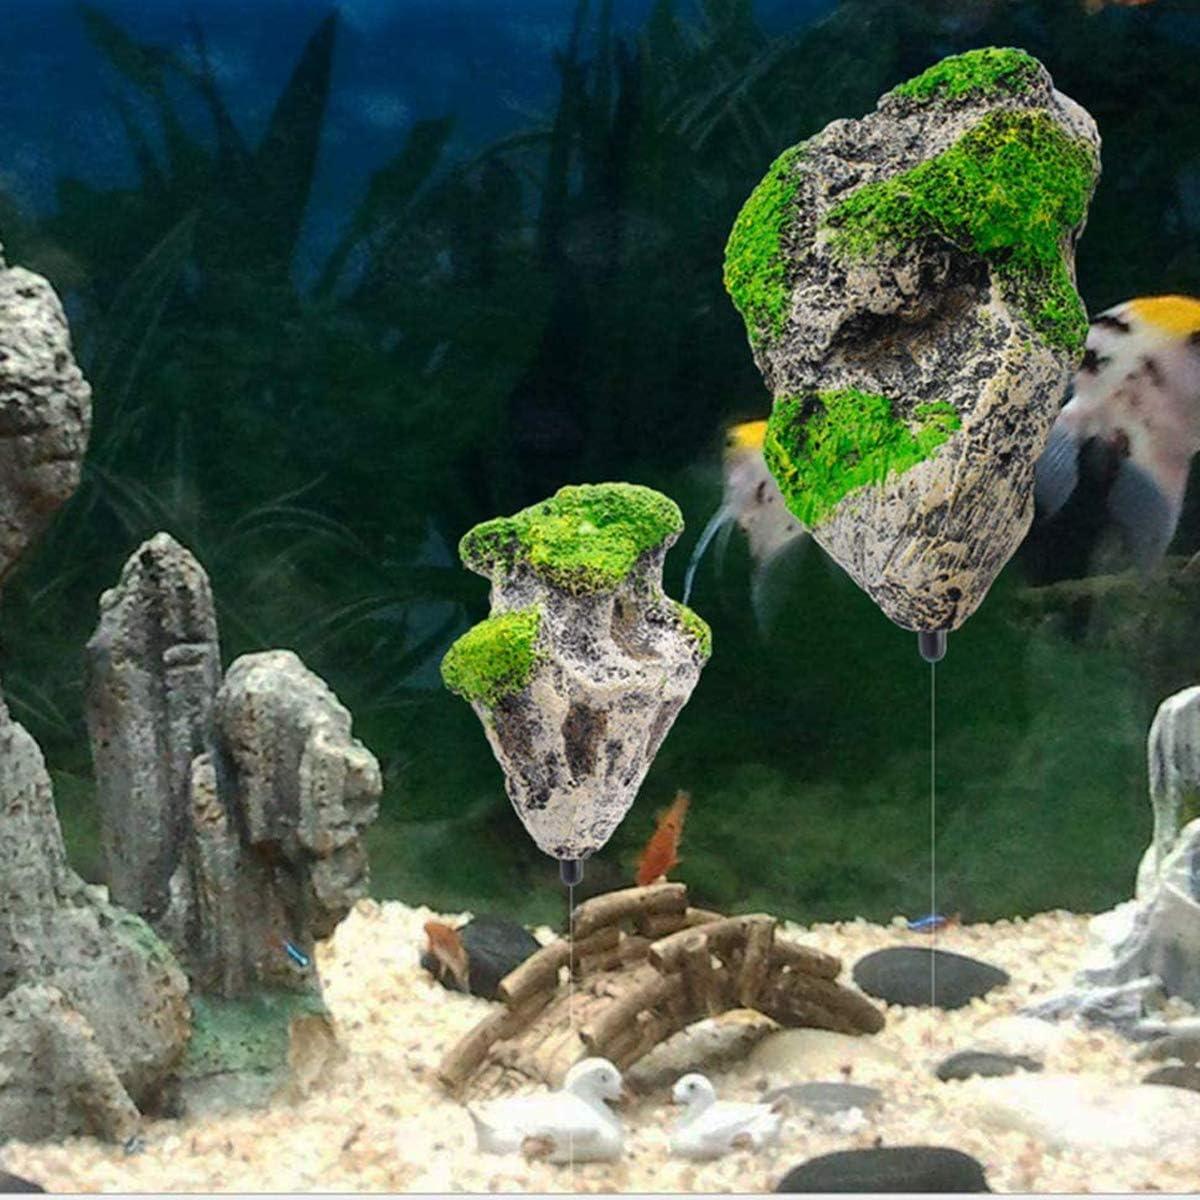 Floating Rock Resin Stone Medium Fish Tank Decorated Rock NGe Aquarium Decorated with Suspended Rock